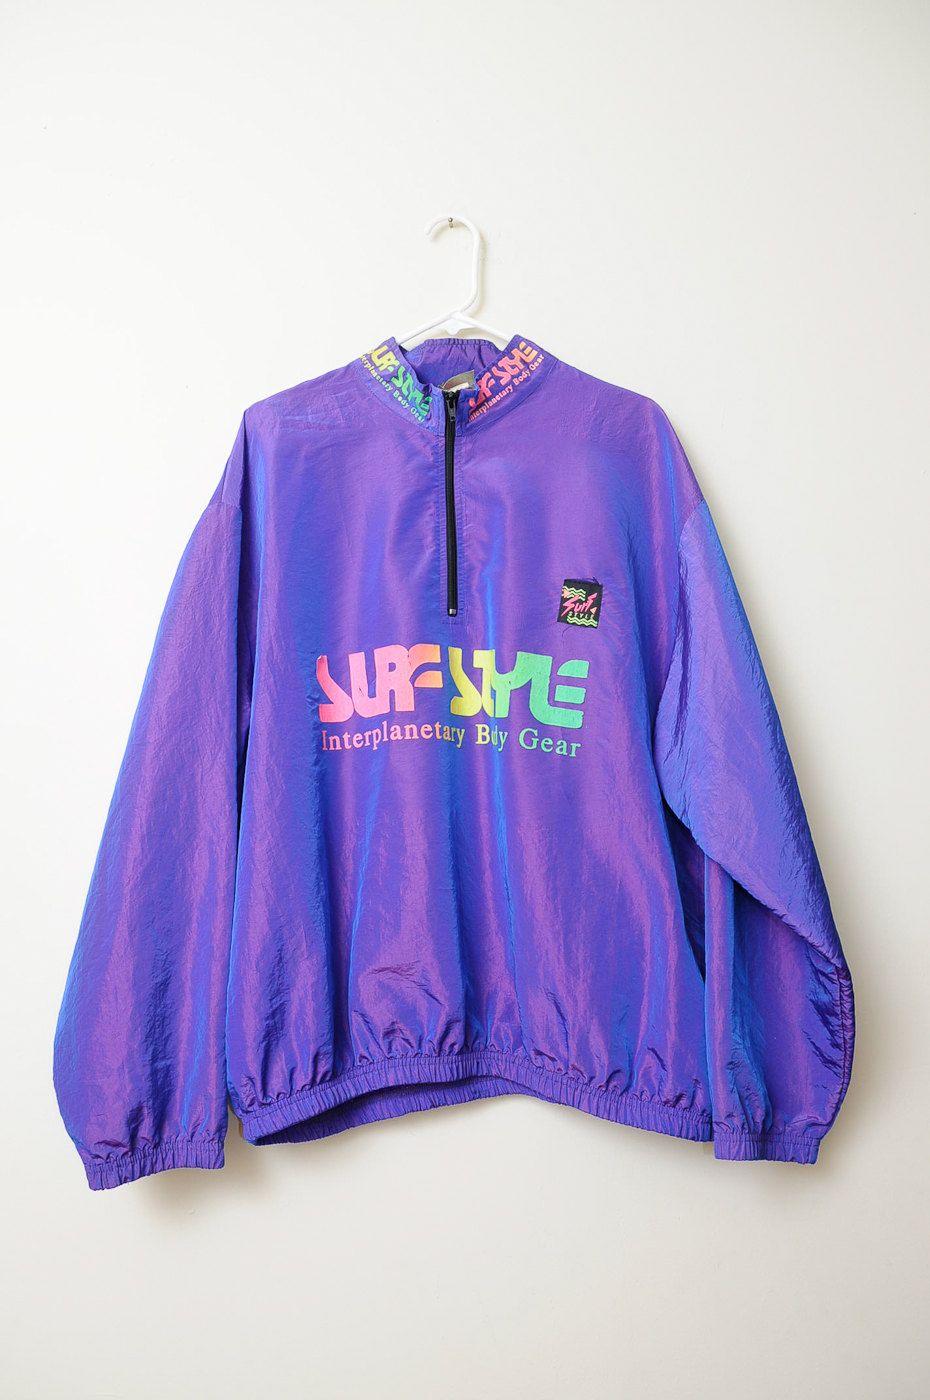 b26eea64a260 Vintage 80s 90s Neon Surf Style Pullover Windbreaker Jacket ...